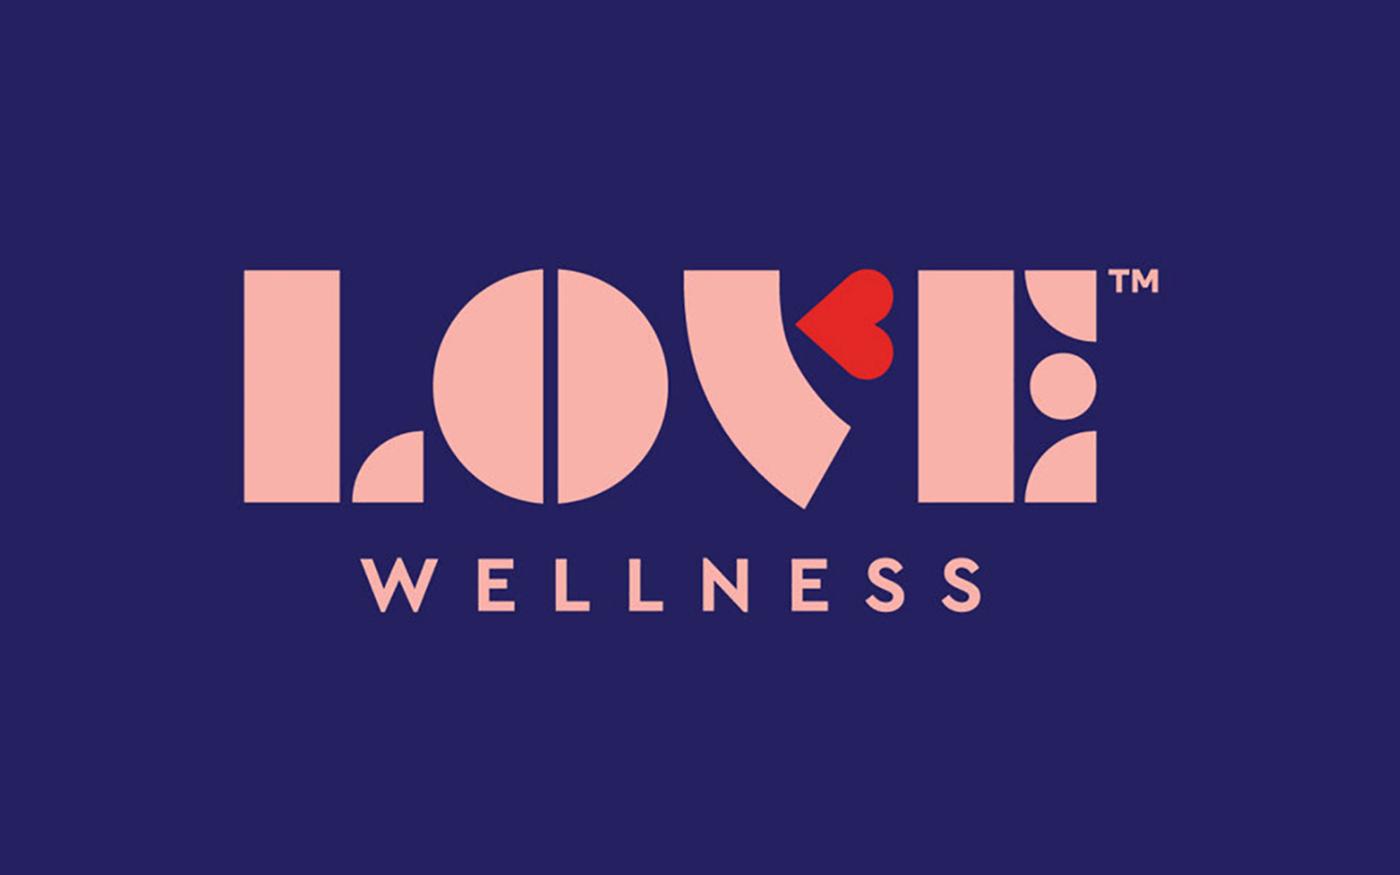 Wellness Actually的logo设计创意解析